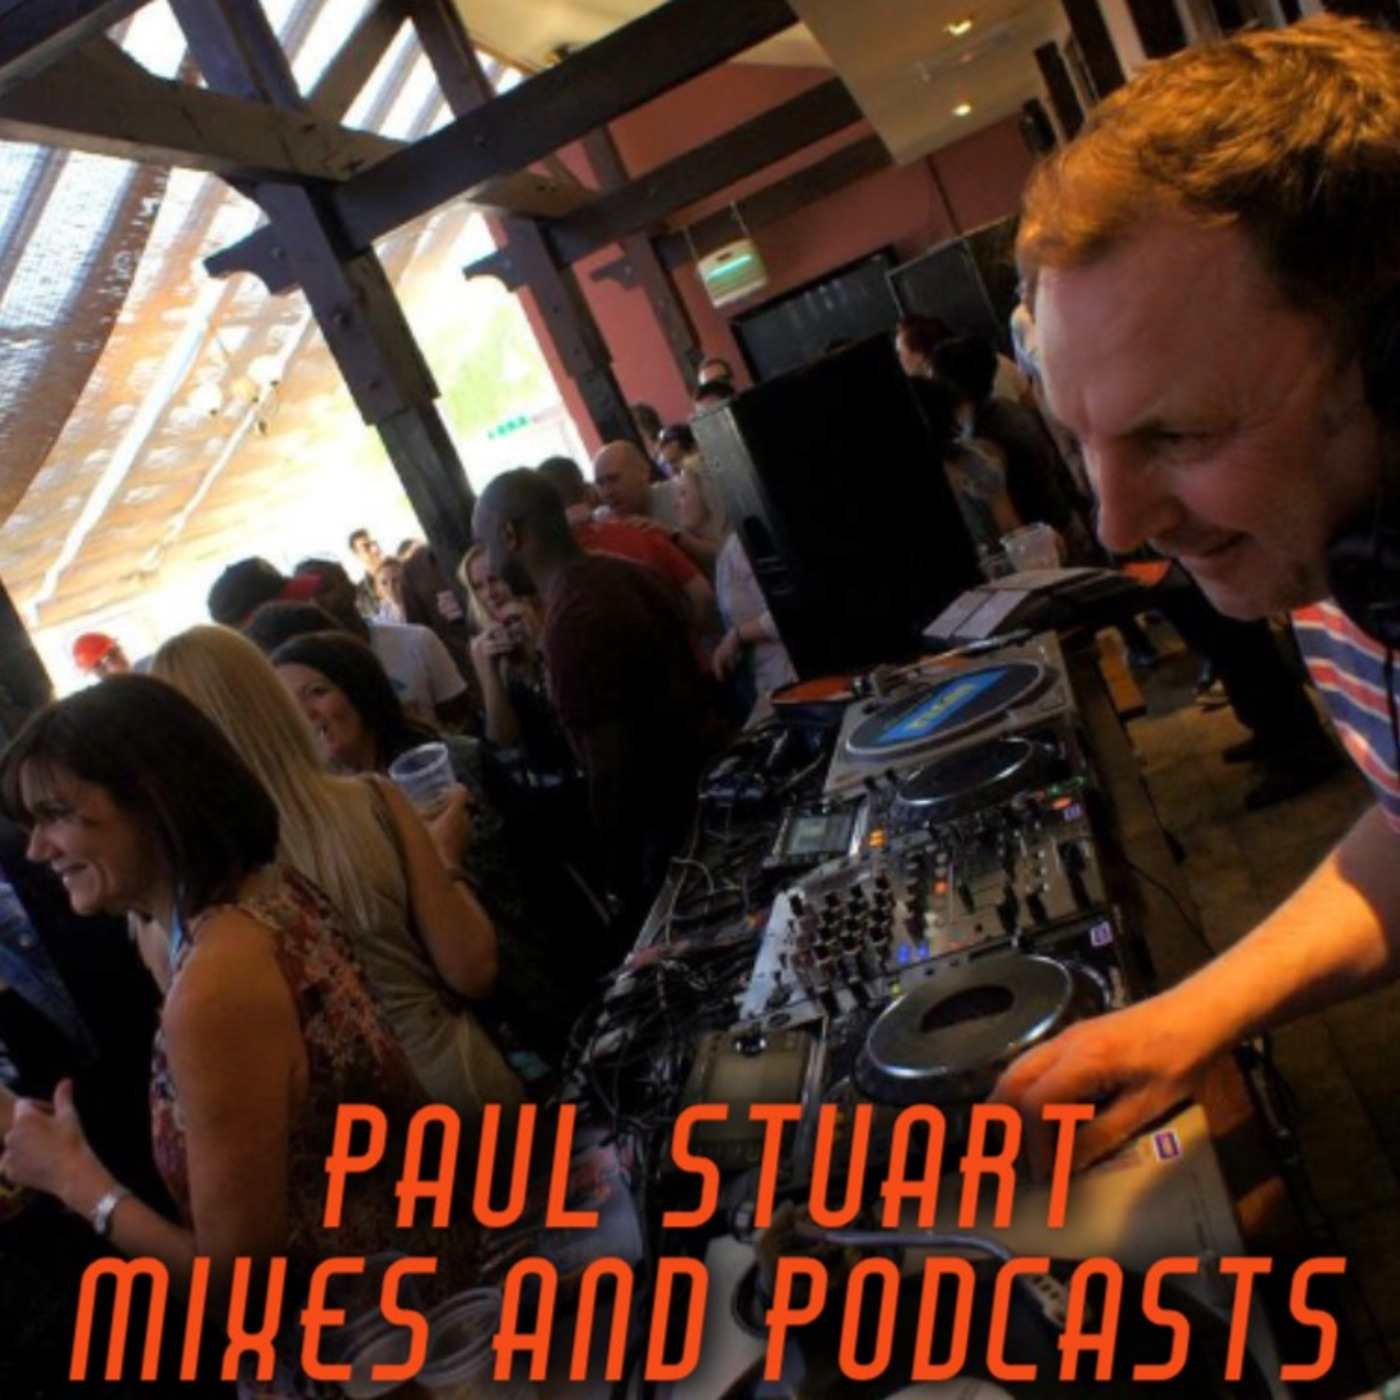 Paul Stuart Mixes and Podcasts